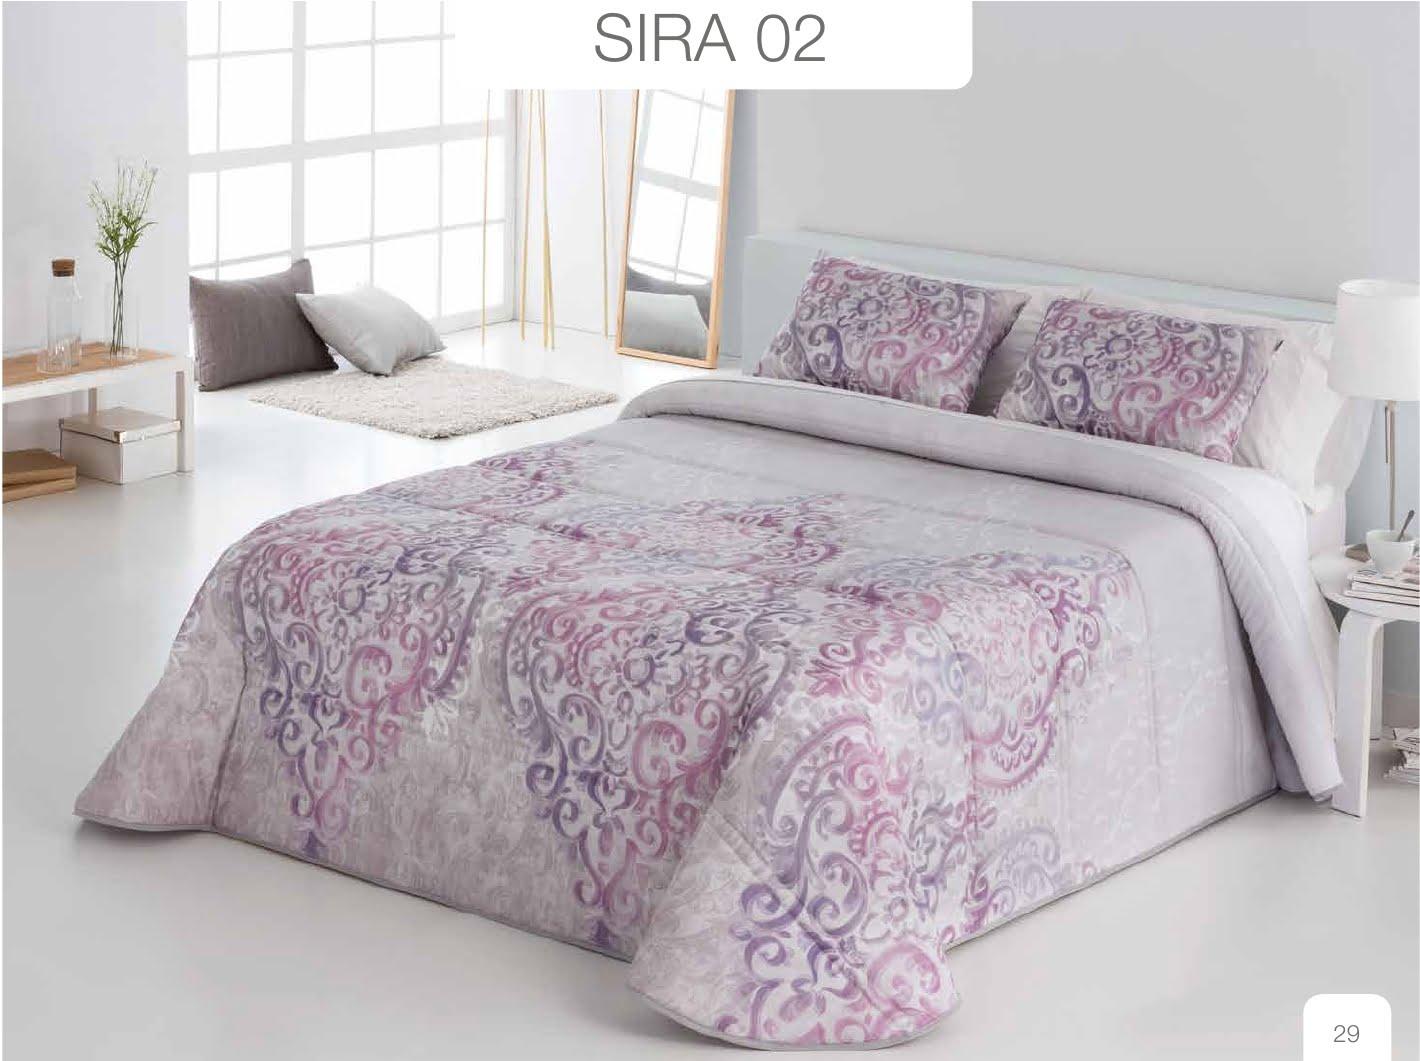 Conforter Bouti Estampado Sira Lila